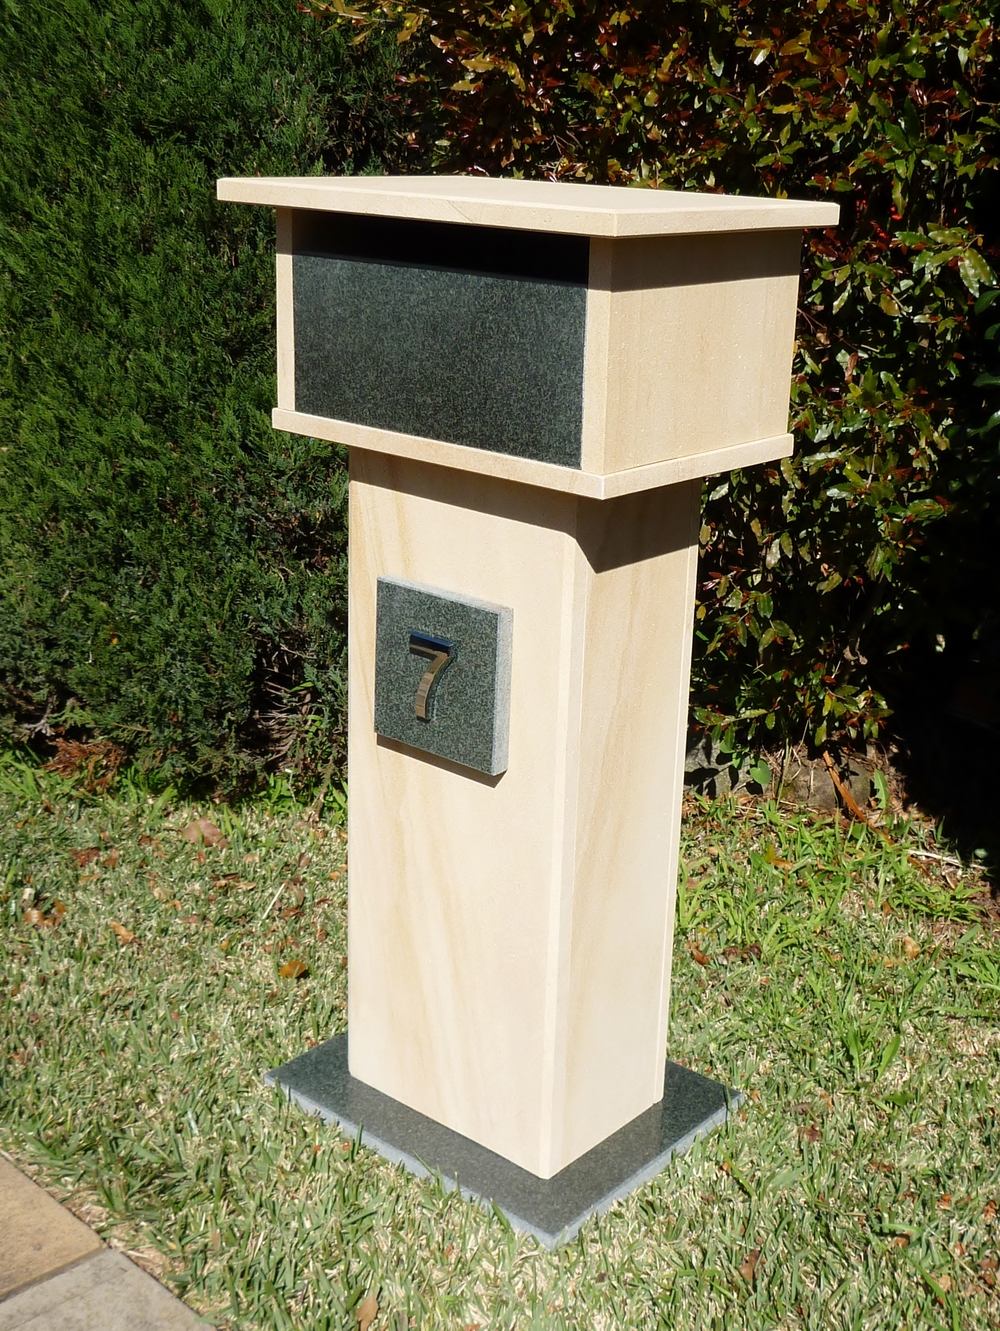 109. Sandstone with granite front, aluminium back door with 2 key lock lock 400x300x870 $374